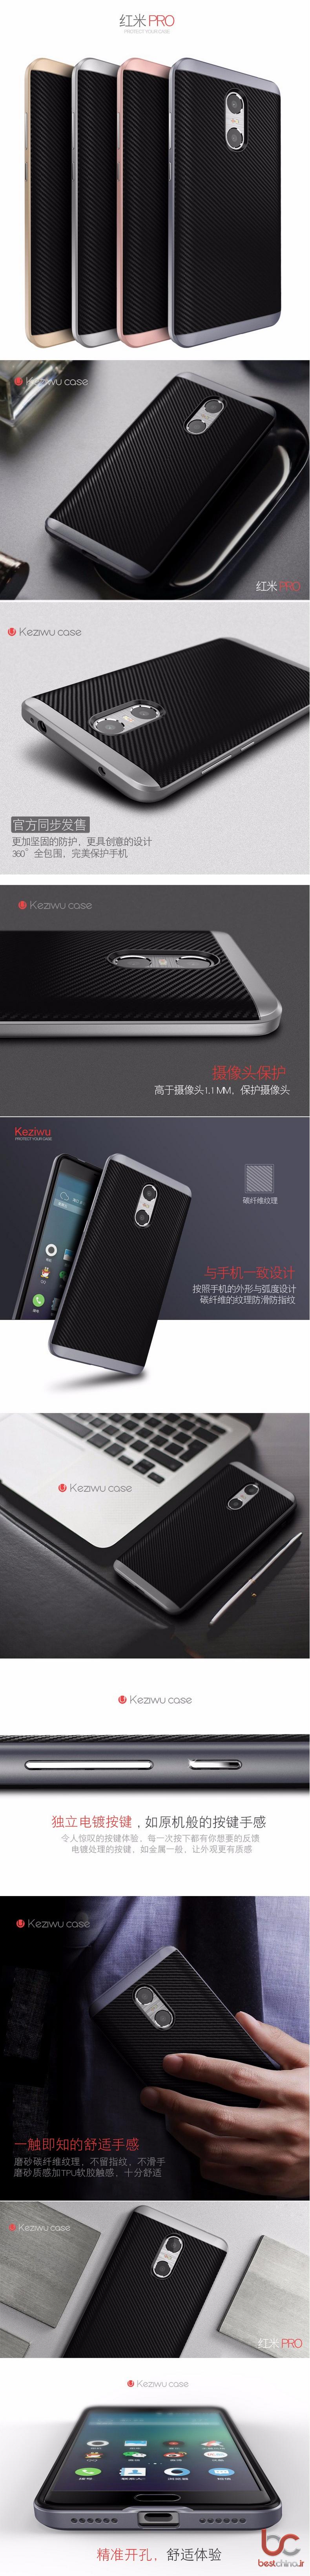 xiaomi-redmi-pro-ucase-back-cover-1